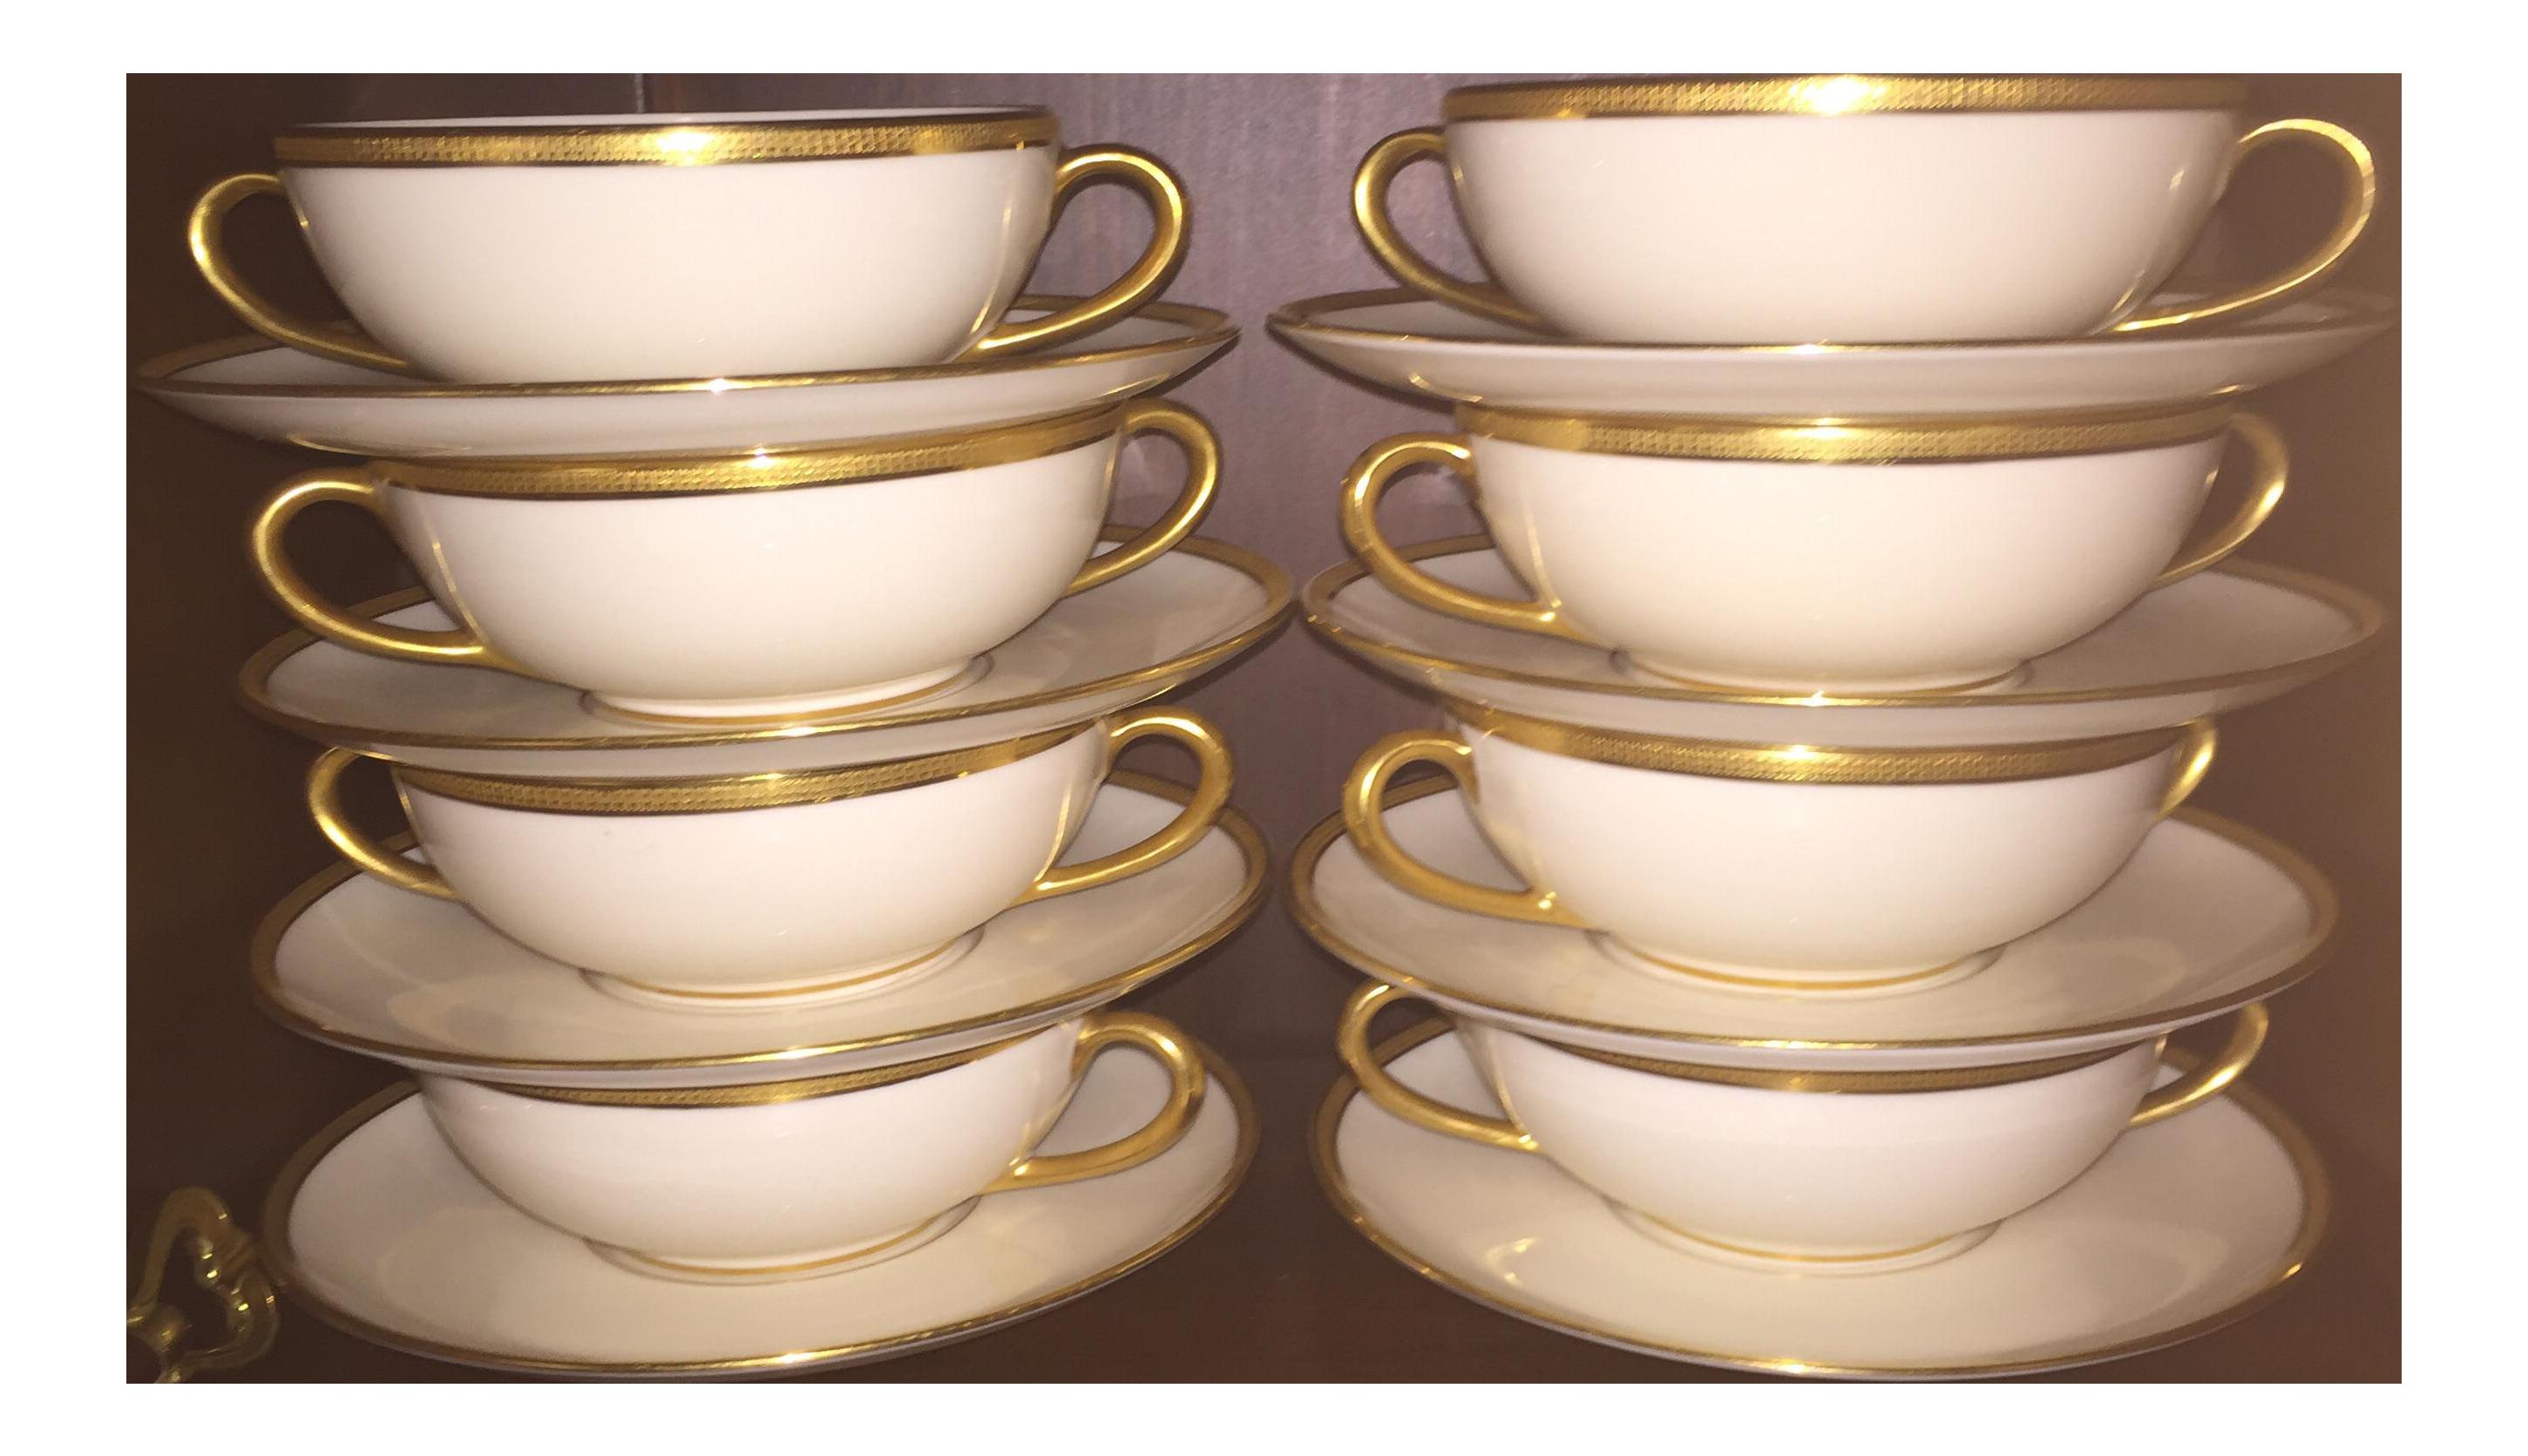 Plate clipart soup bowl. Marshall fields lenox cream